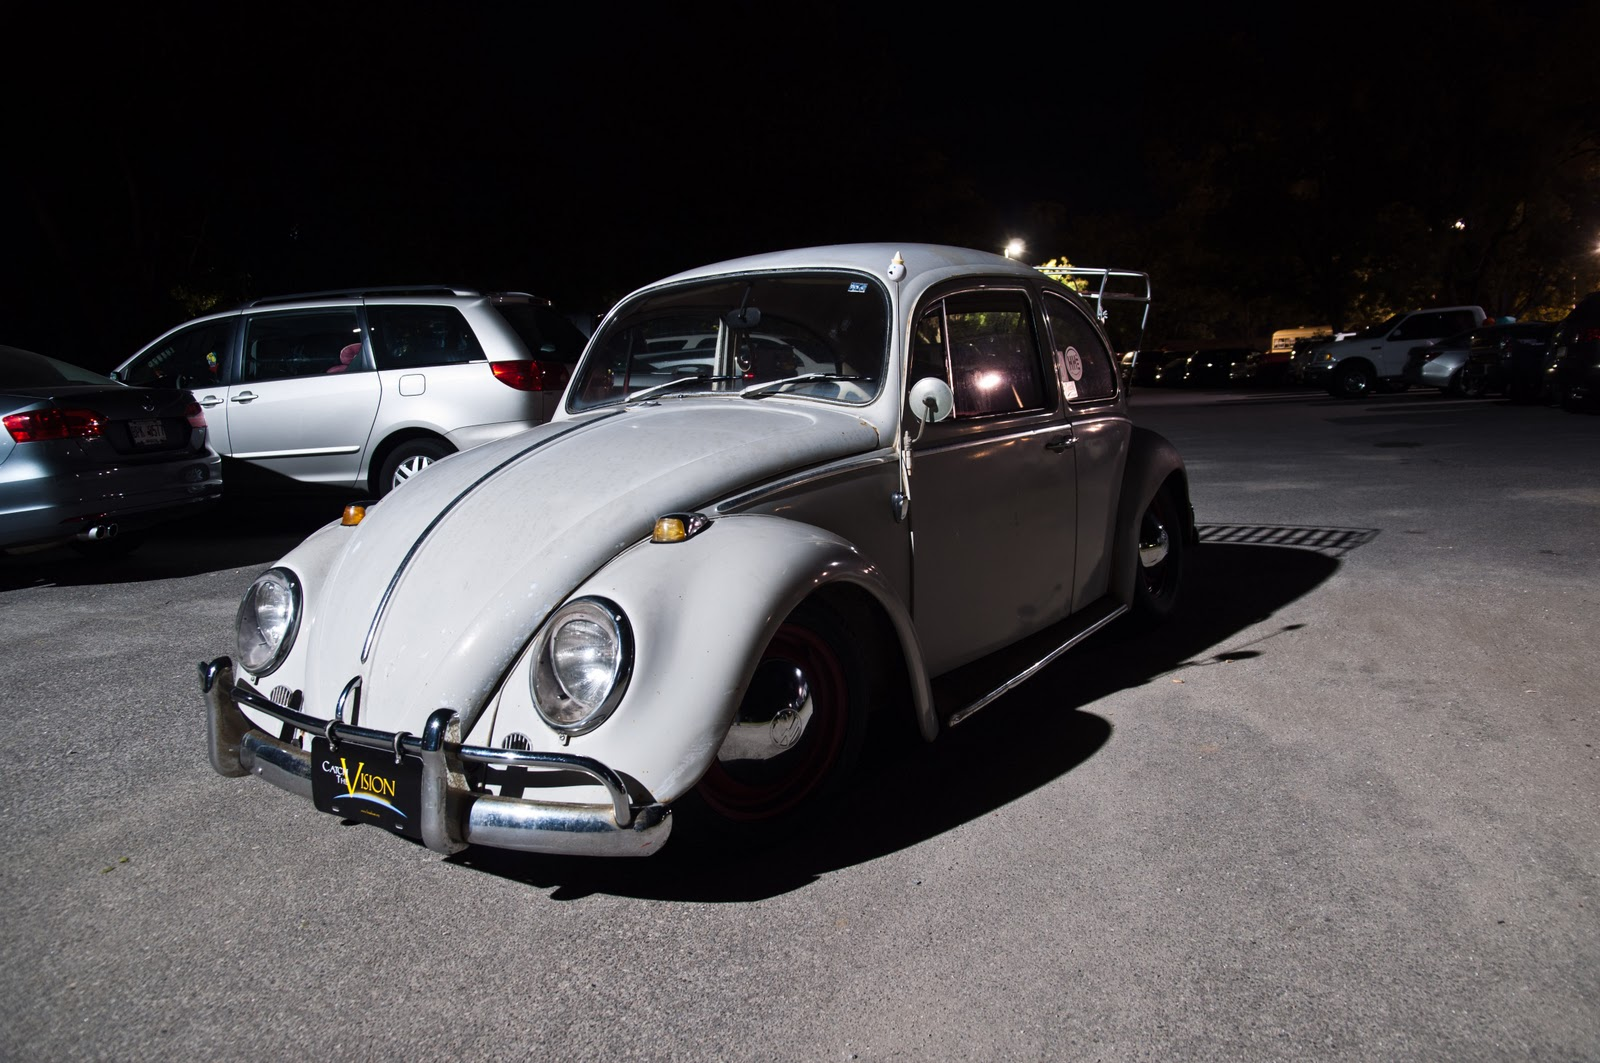 Otis - my '65 Beetle DSC_0056